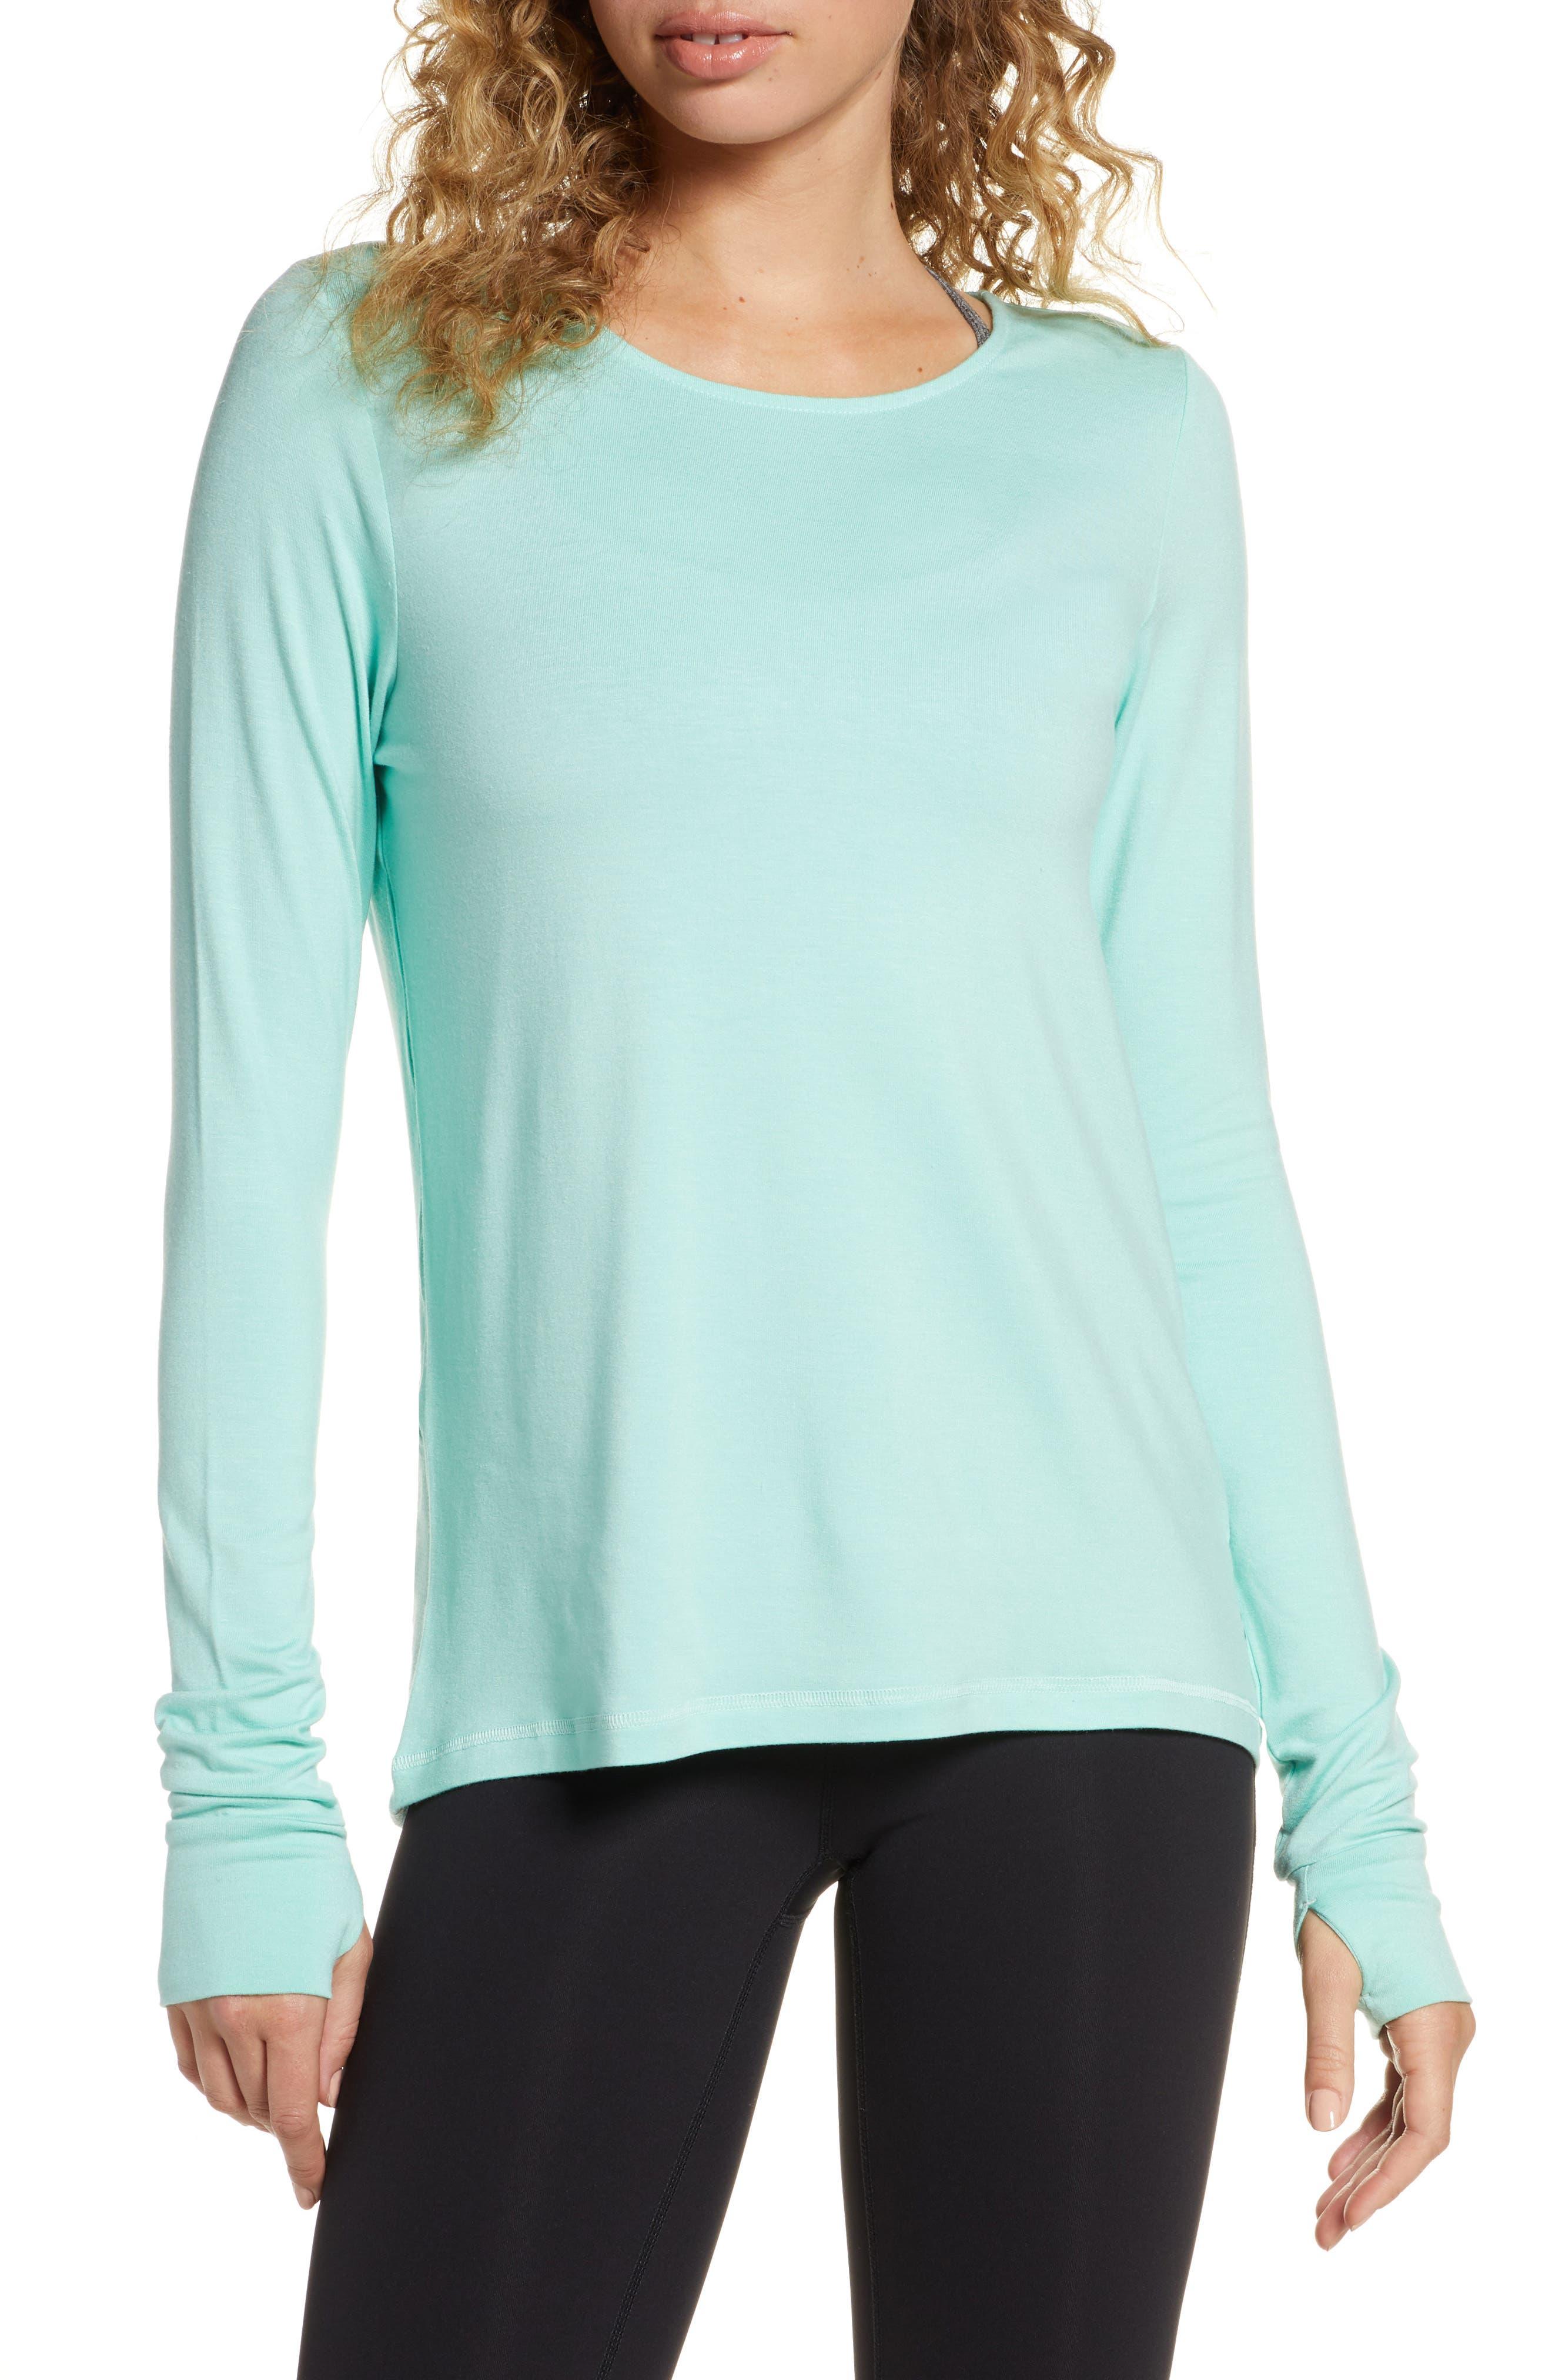 Activewear Women's Clothing Learned Sweaty Betty Long Sleeve Top Size Medium